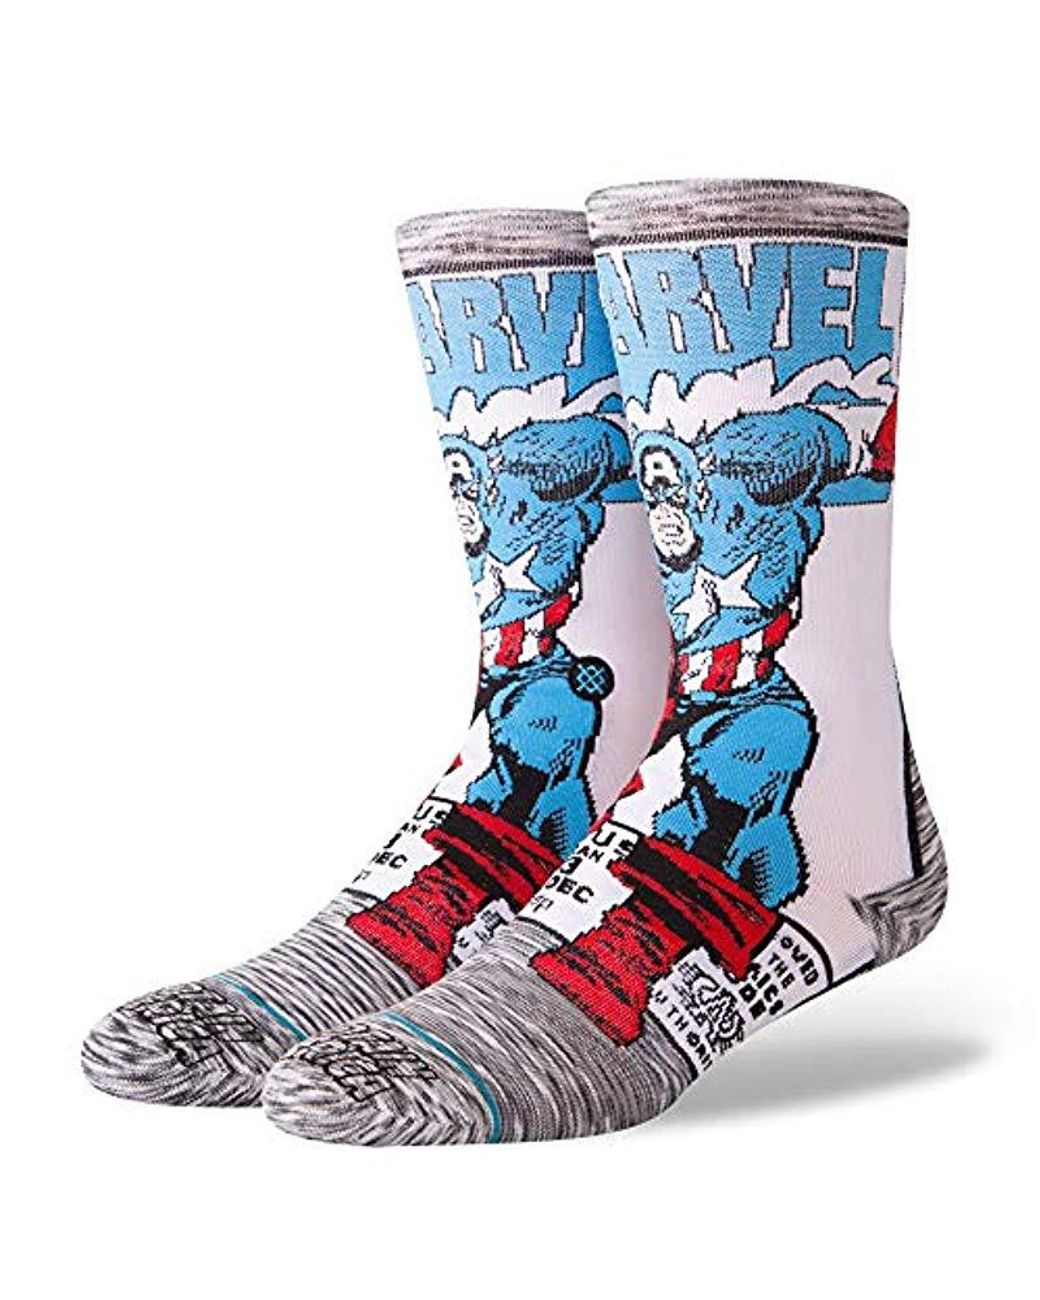 STANCE SOCKS NEW Mens Shade Socks Navy BNWT